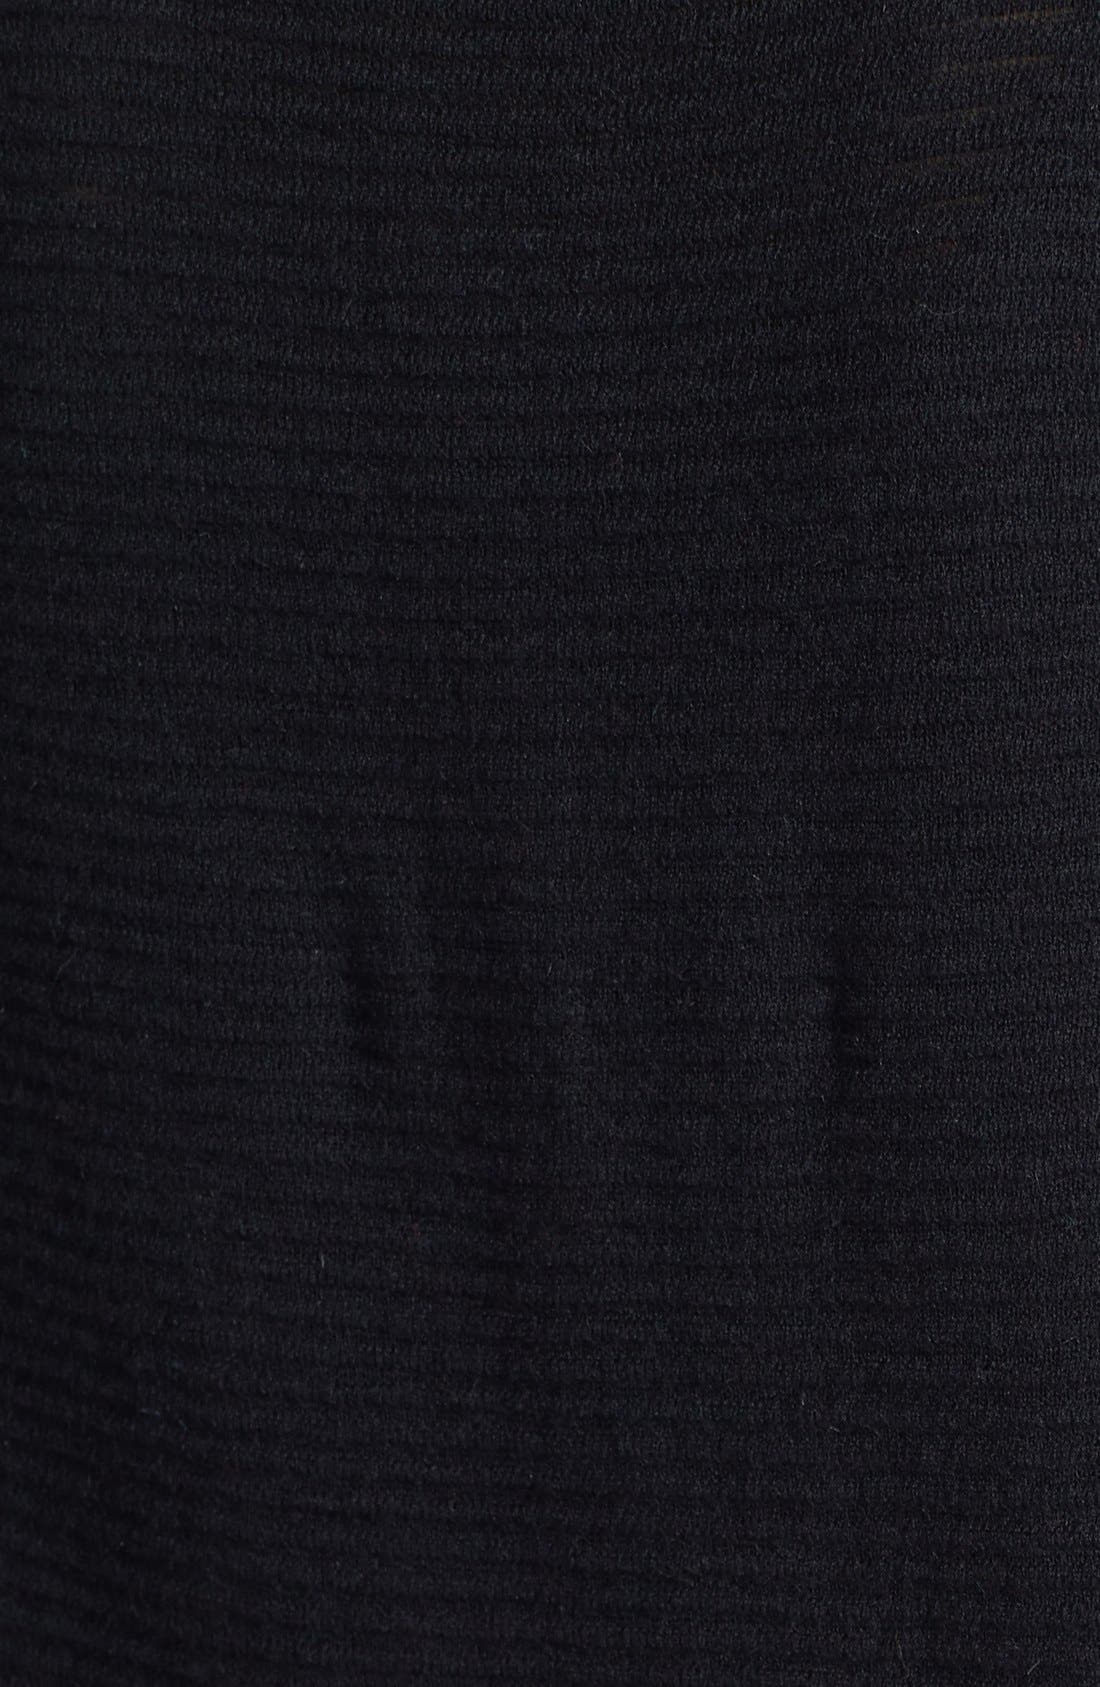 Textured Stripe Lightweight Crewneck Sweater,                             Alternate thumbnail 2, color,                             001